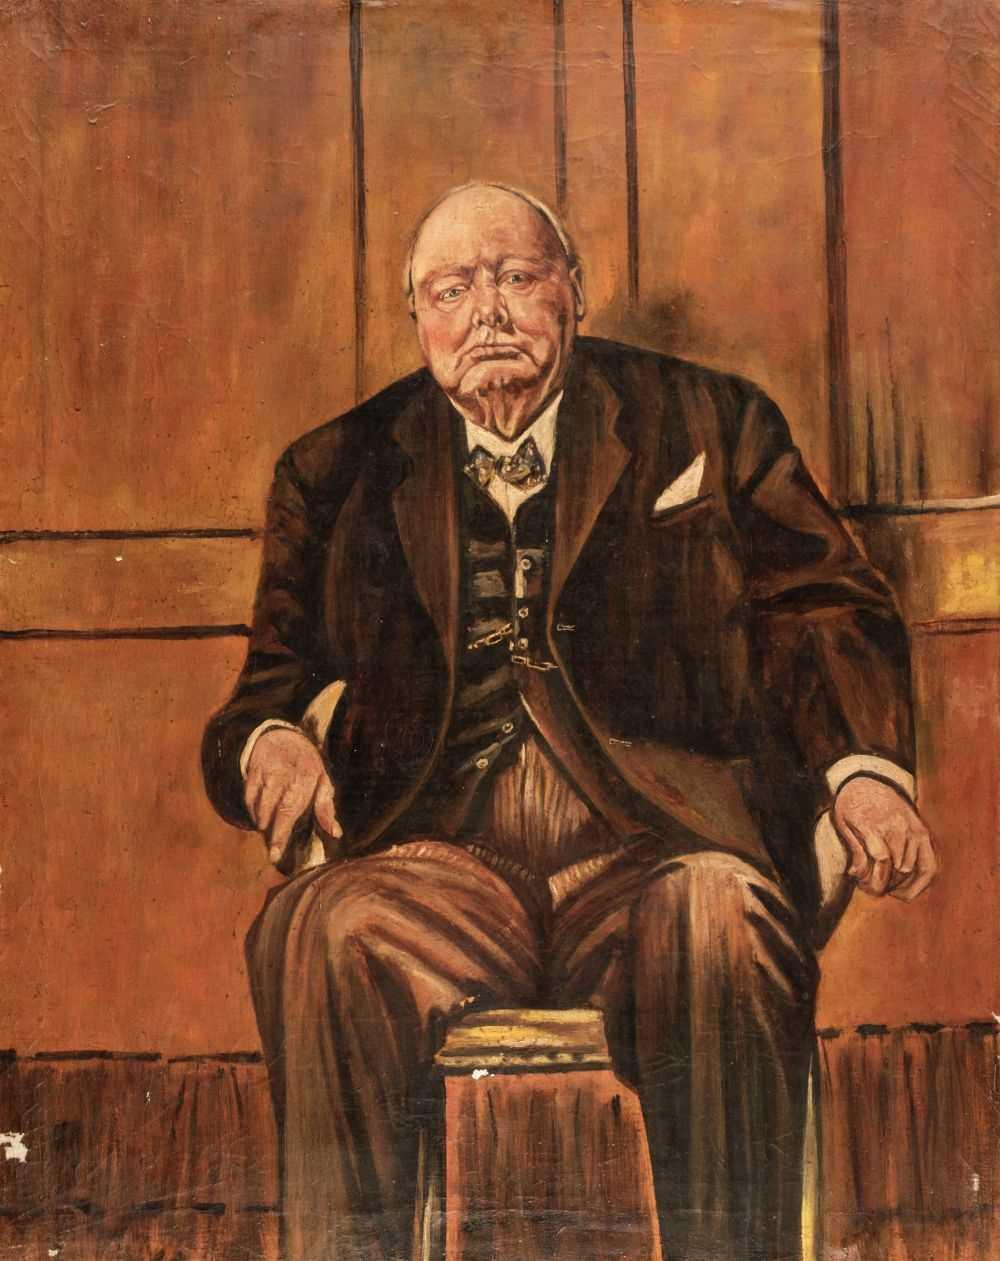 Winston Churchill Portrait Painting : winston, churchill, portrait, painting, Sutherland, (Graham,, 1903-1980,, After).